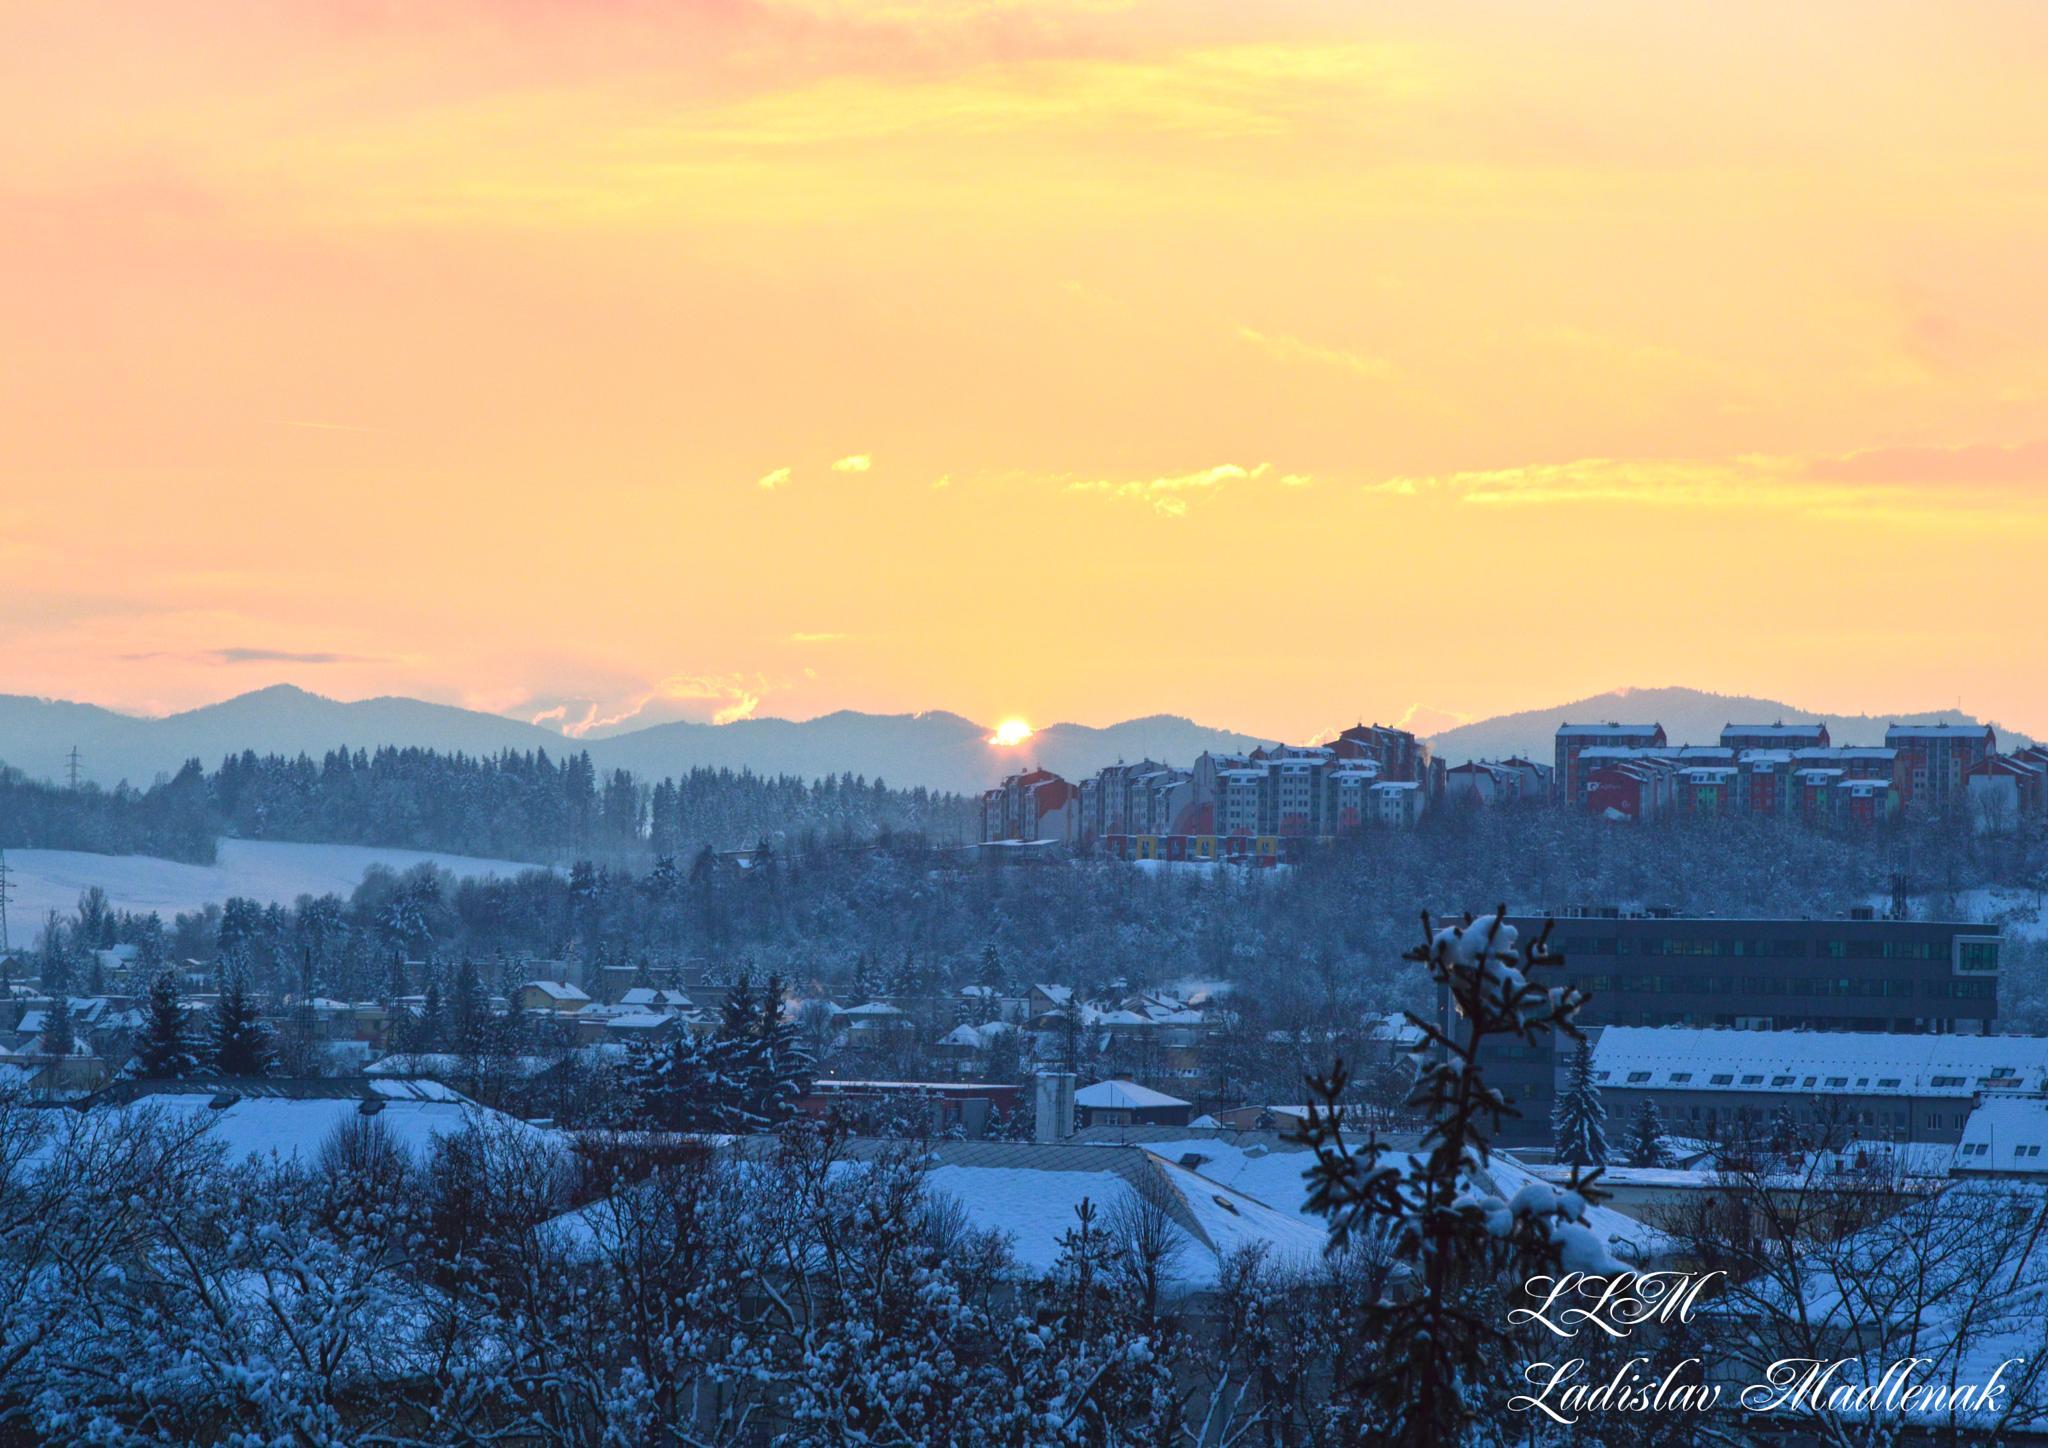 Sunset by LLadislav Madlenak